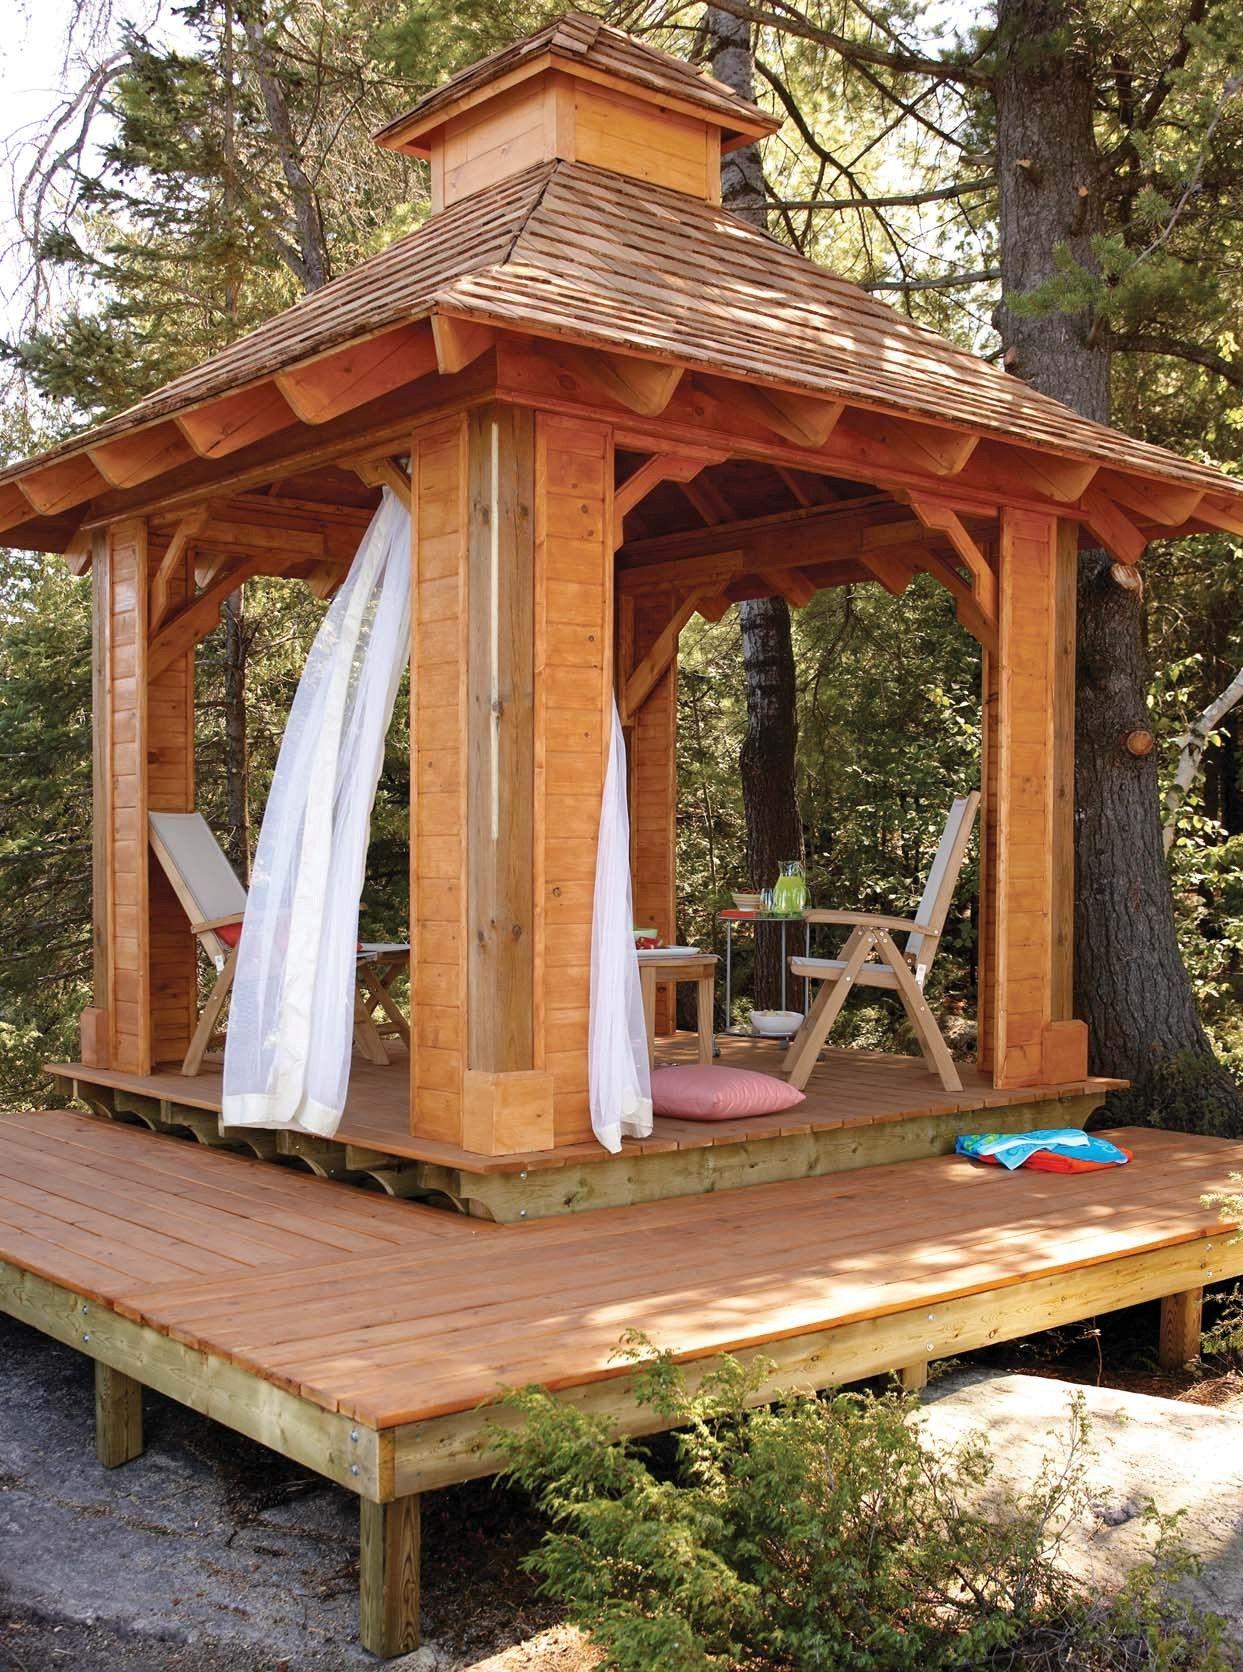 Free Gazebo Plans-14 DIY Ideas to Enjoy Outdoor Living | For the ...